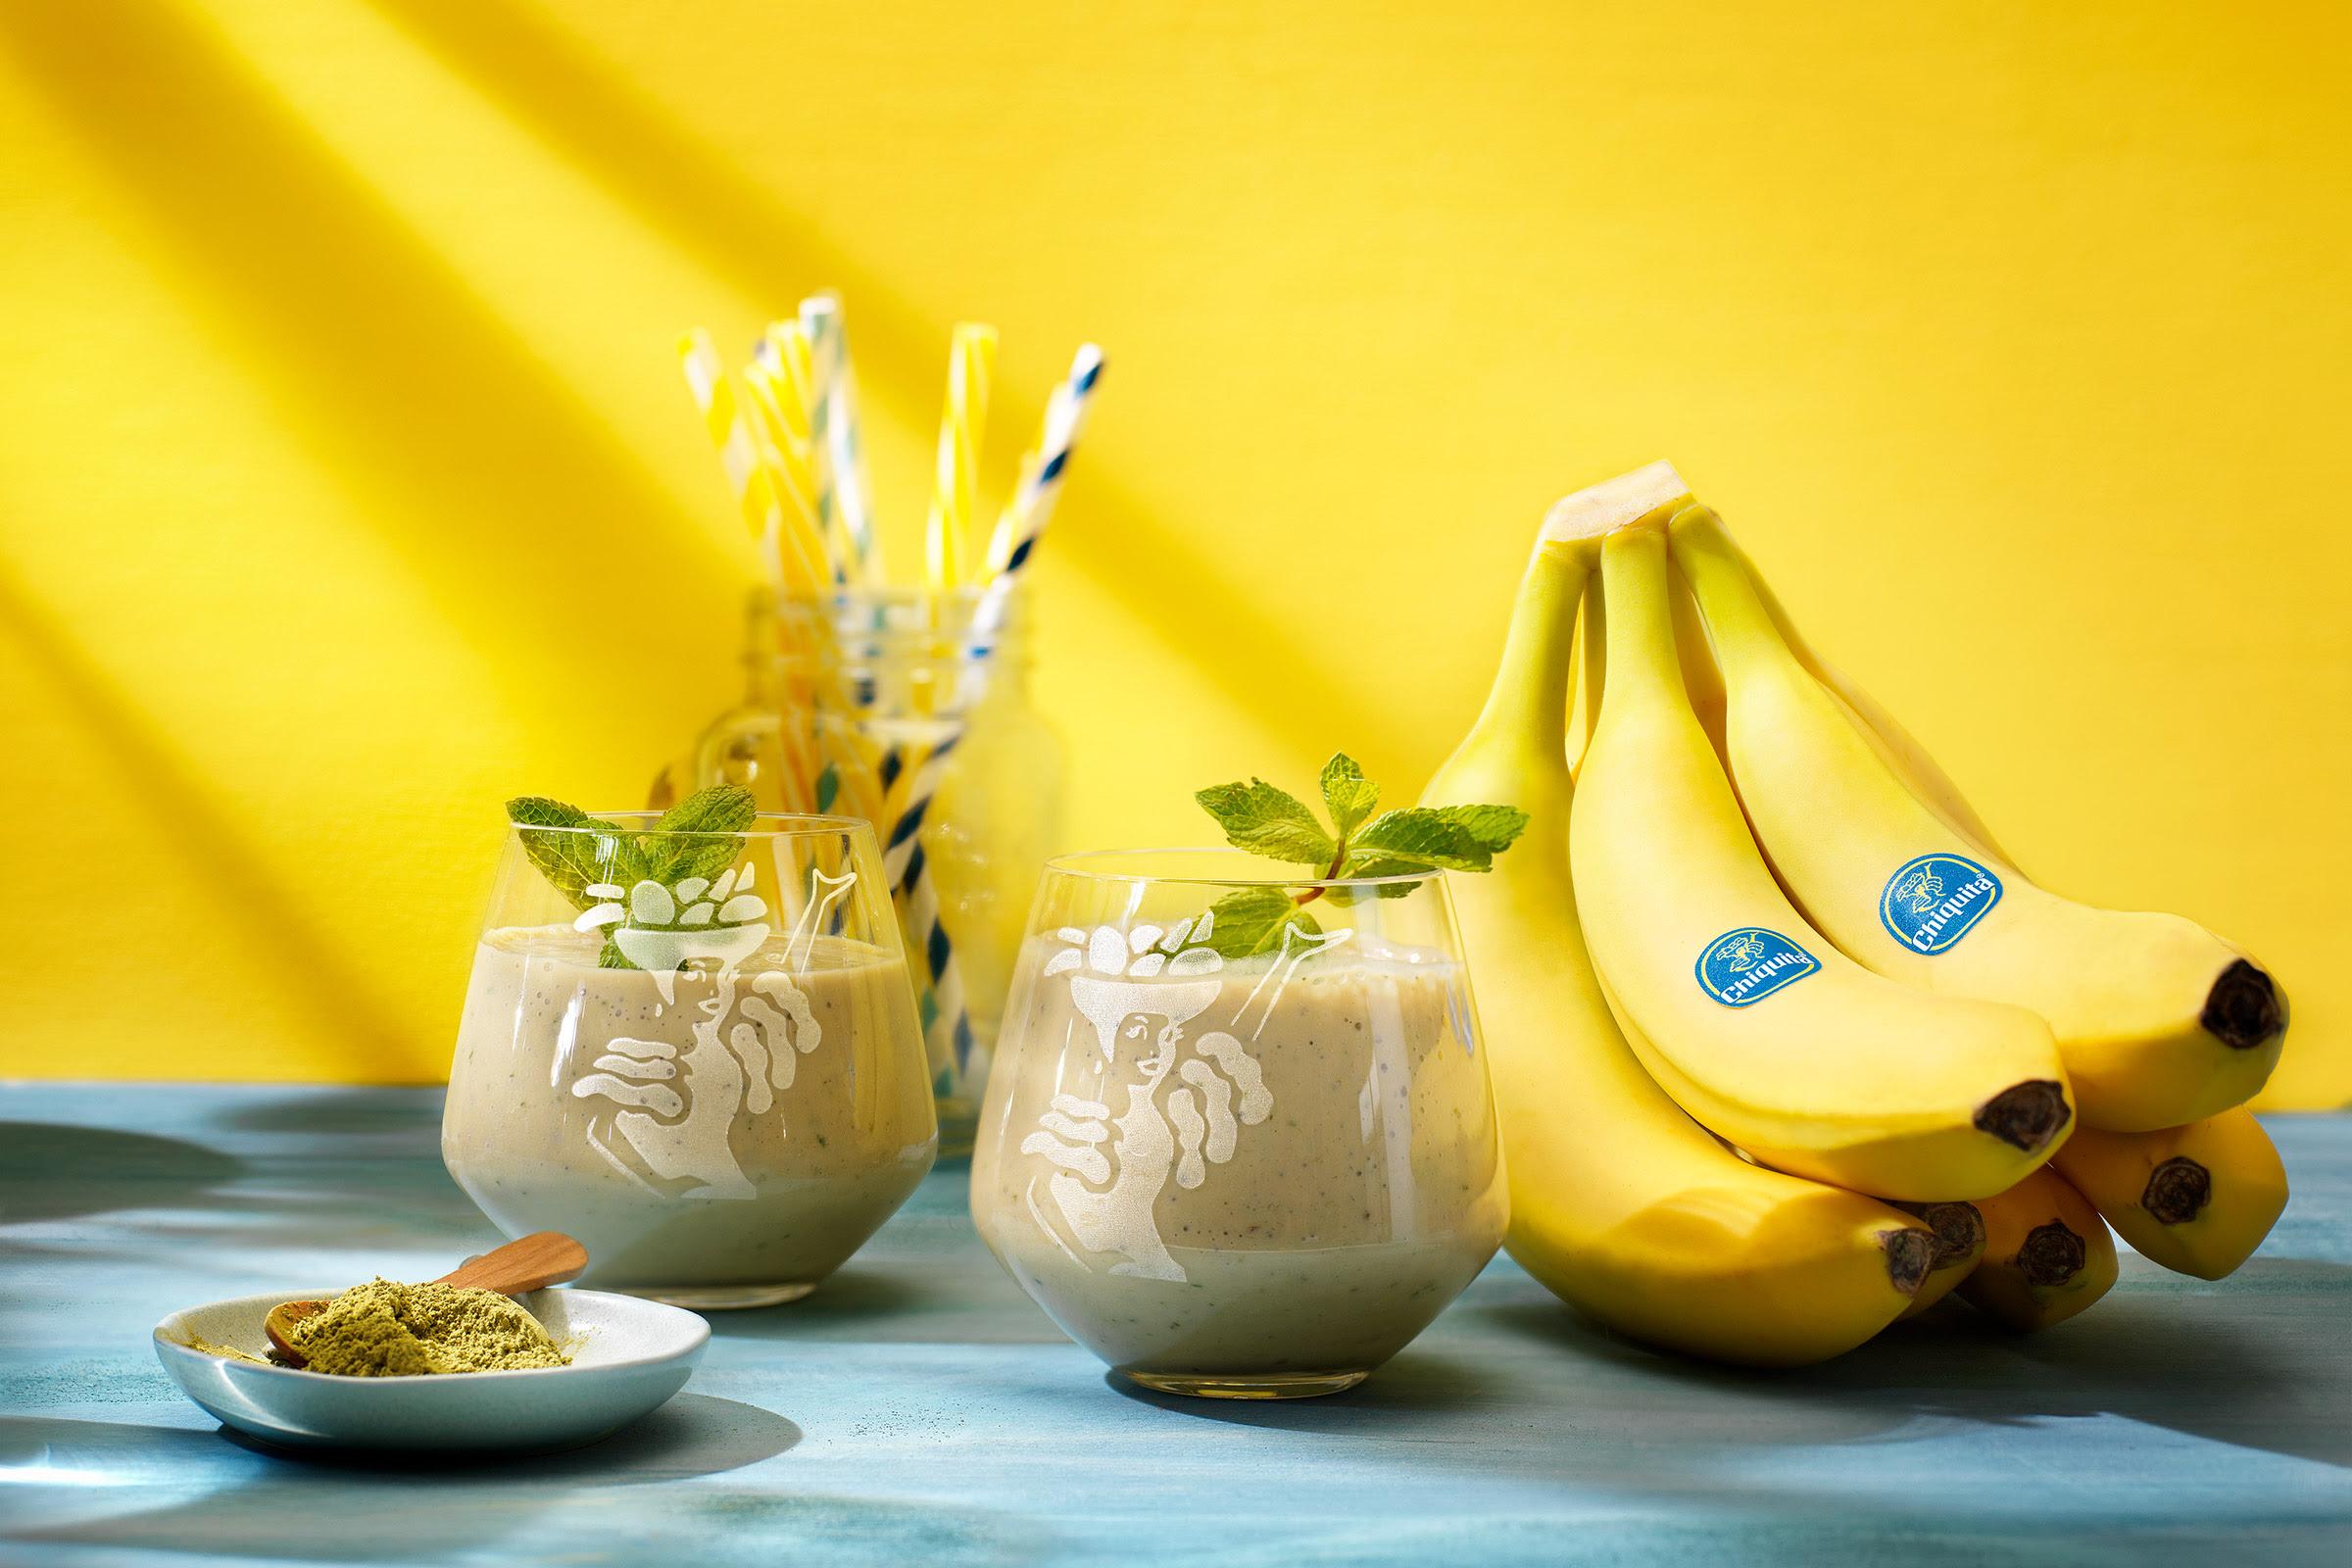 Green-tea-Chiquita-banana-shake (2).jpg